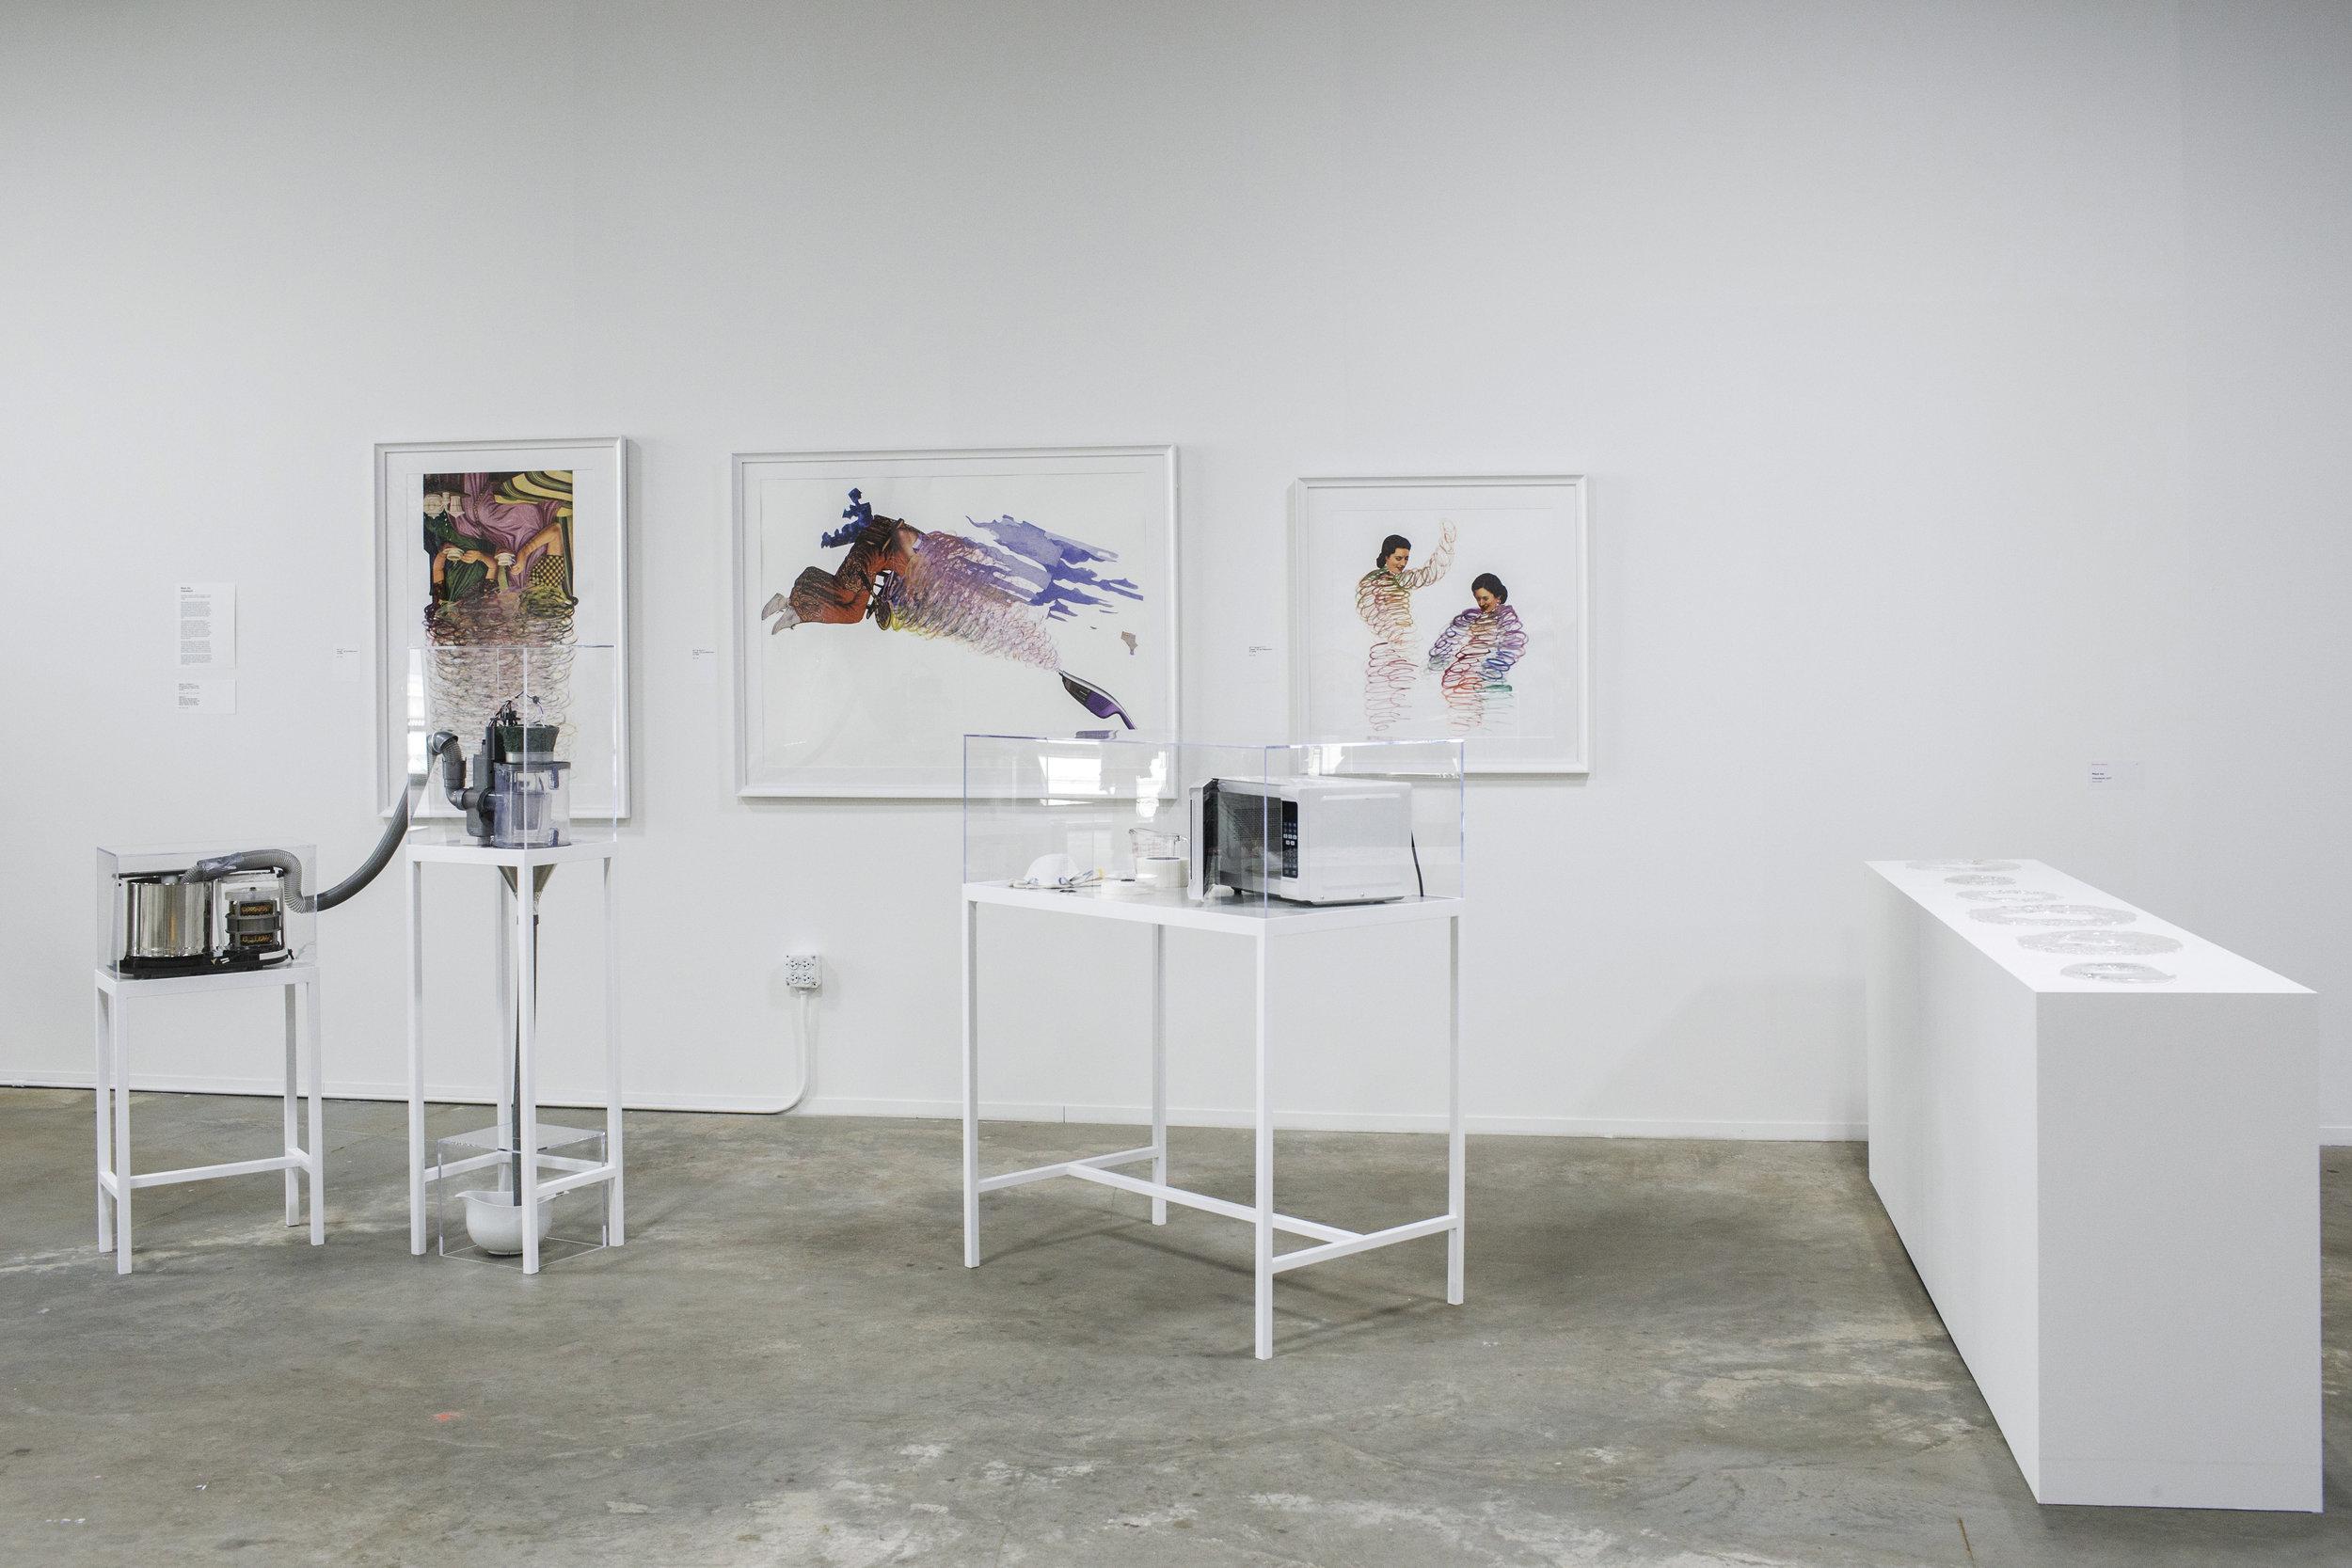 'Khandayati' exhibited at Design Show 2017, Block 37, Chicago, Illinois (May 2017)    Photo Credit:  Ambika Singh